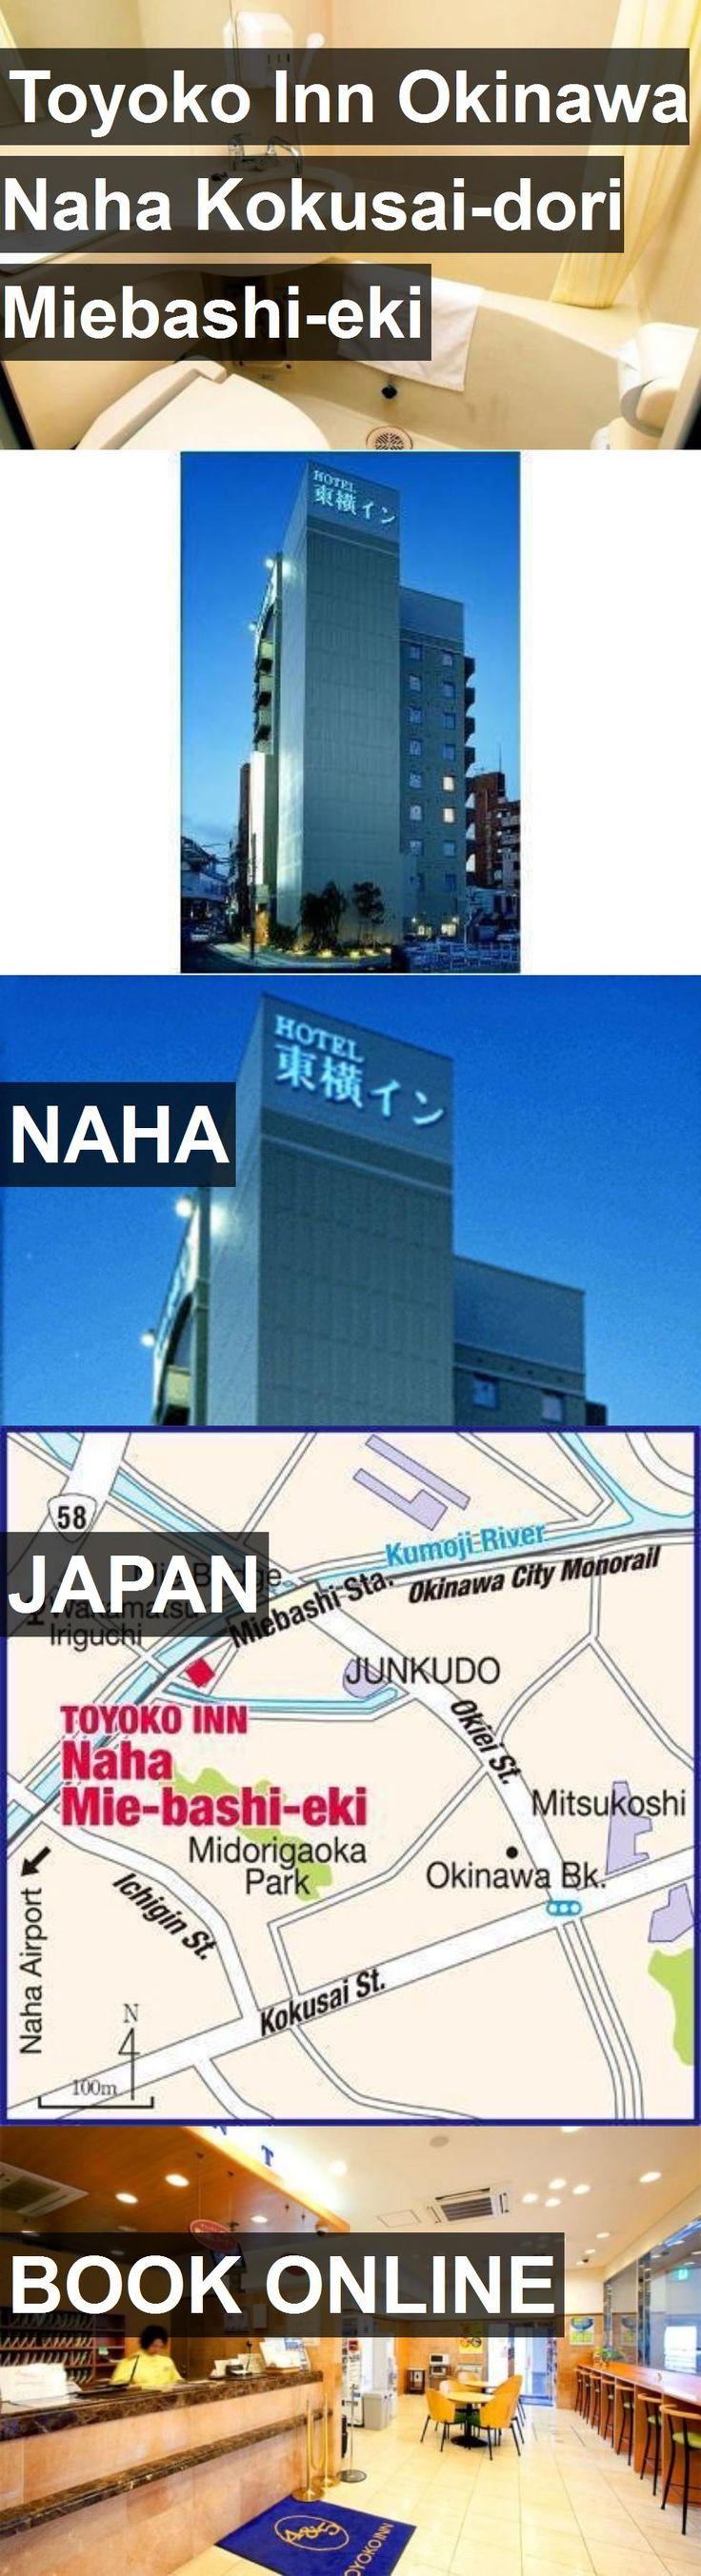 Hotel Toyoko Inn Okinawa Naha Kokusai-dori Miebashi-eki in Naha, Japan. For more information, photos, reviews and best prices please follow the link. #Japan #Naha #travel #vacation #hotel